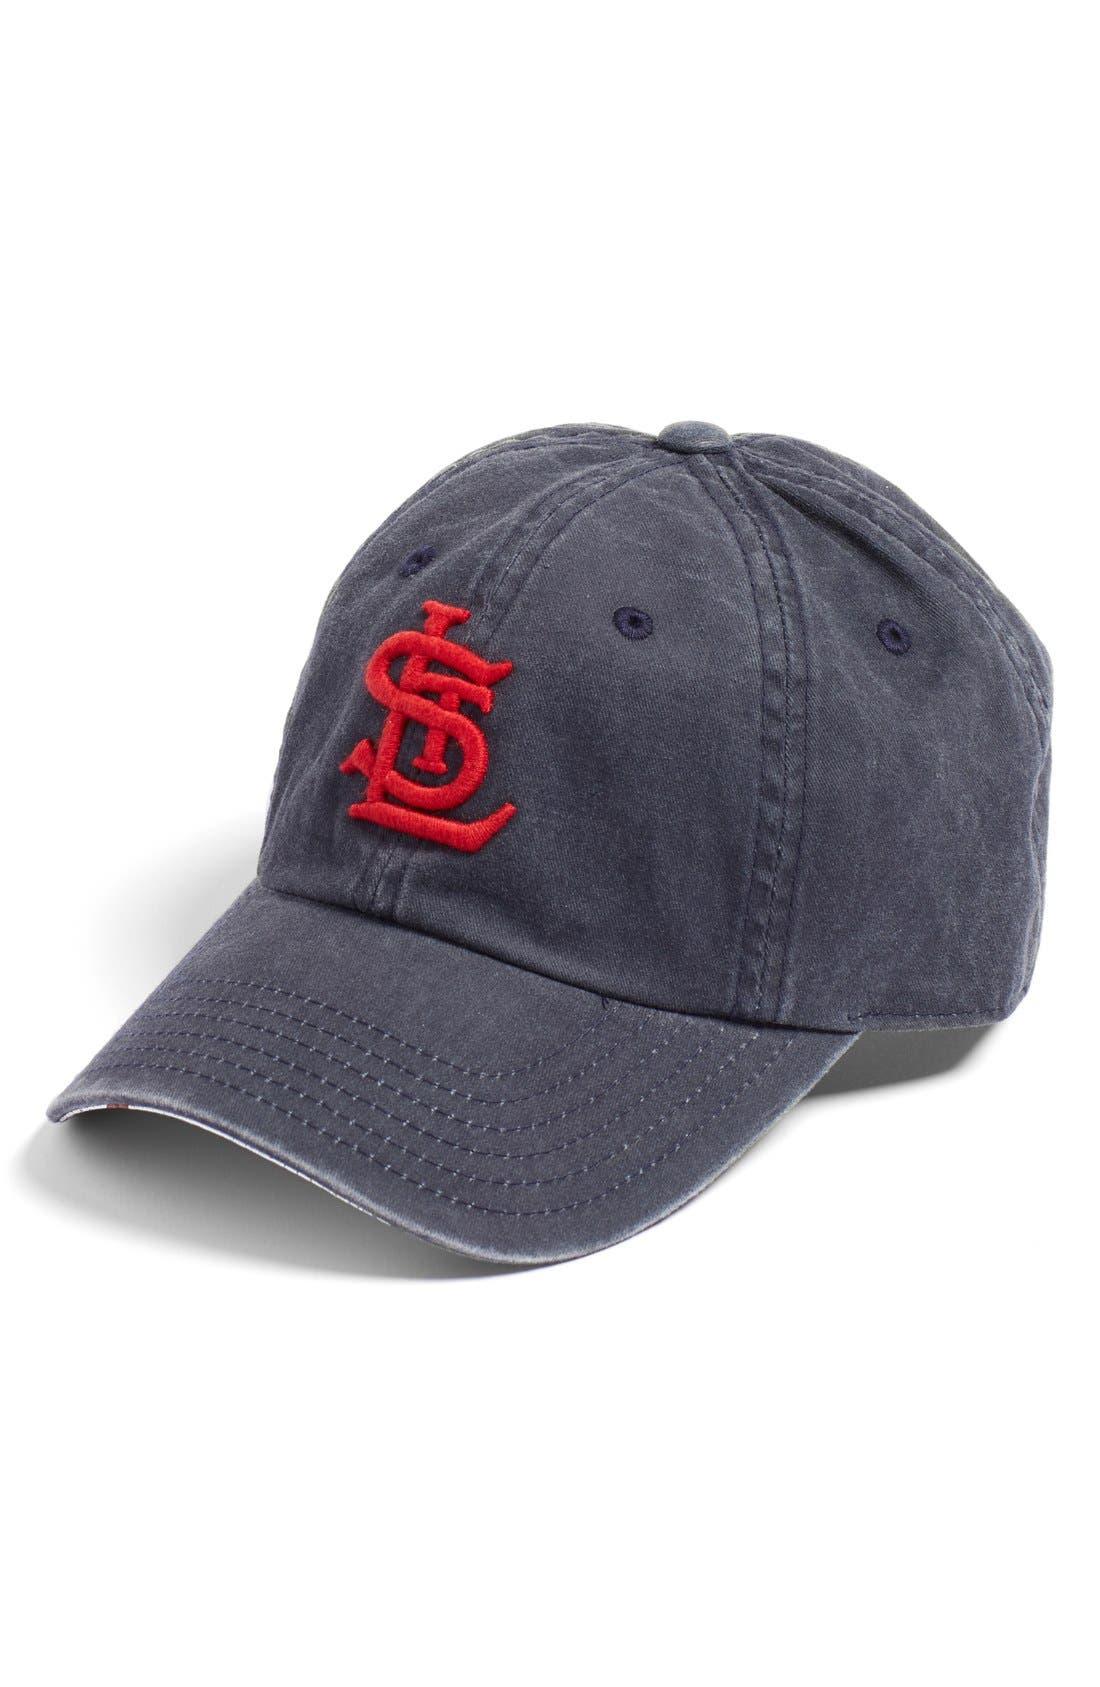 New Raglan St. Louis Cardinals Baseball Cap,                             Main thumbnail 1, color,                             Navy